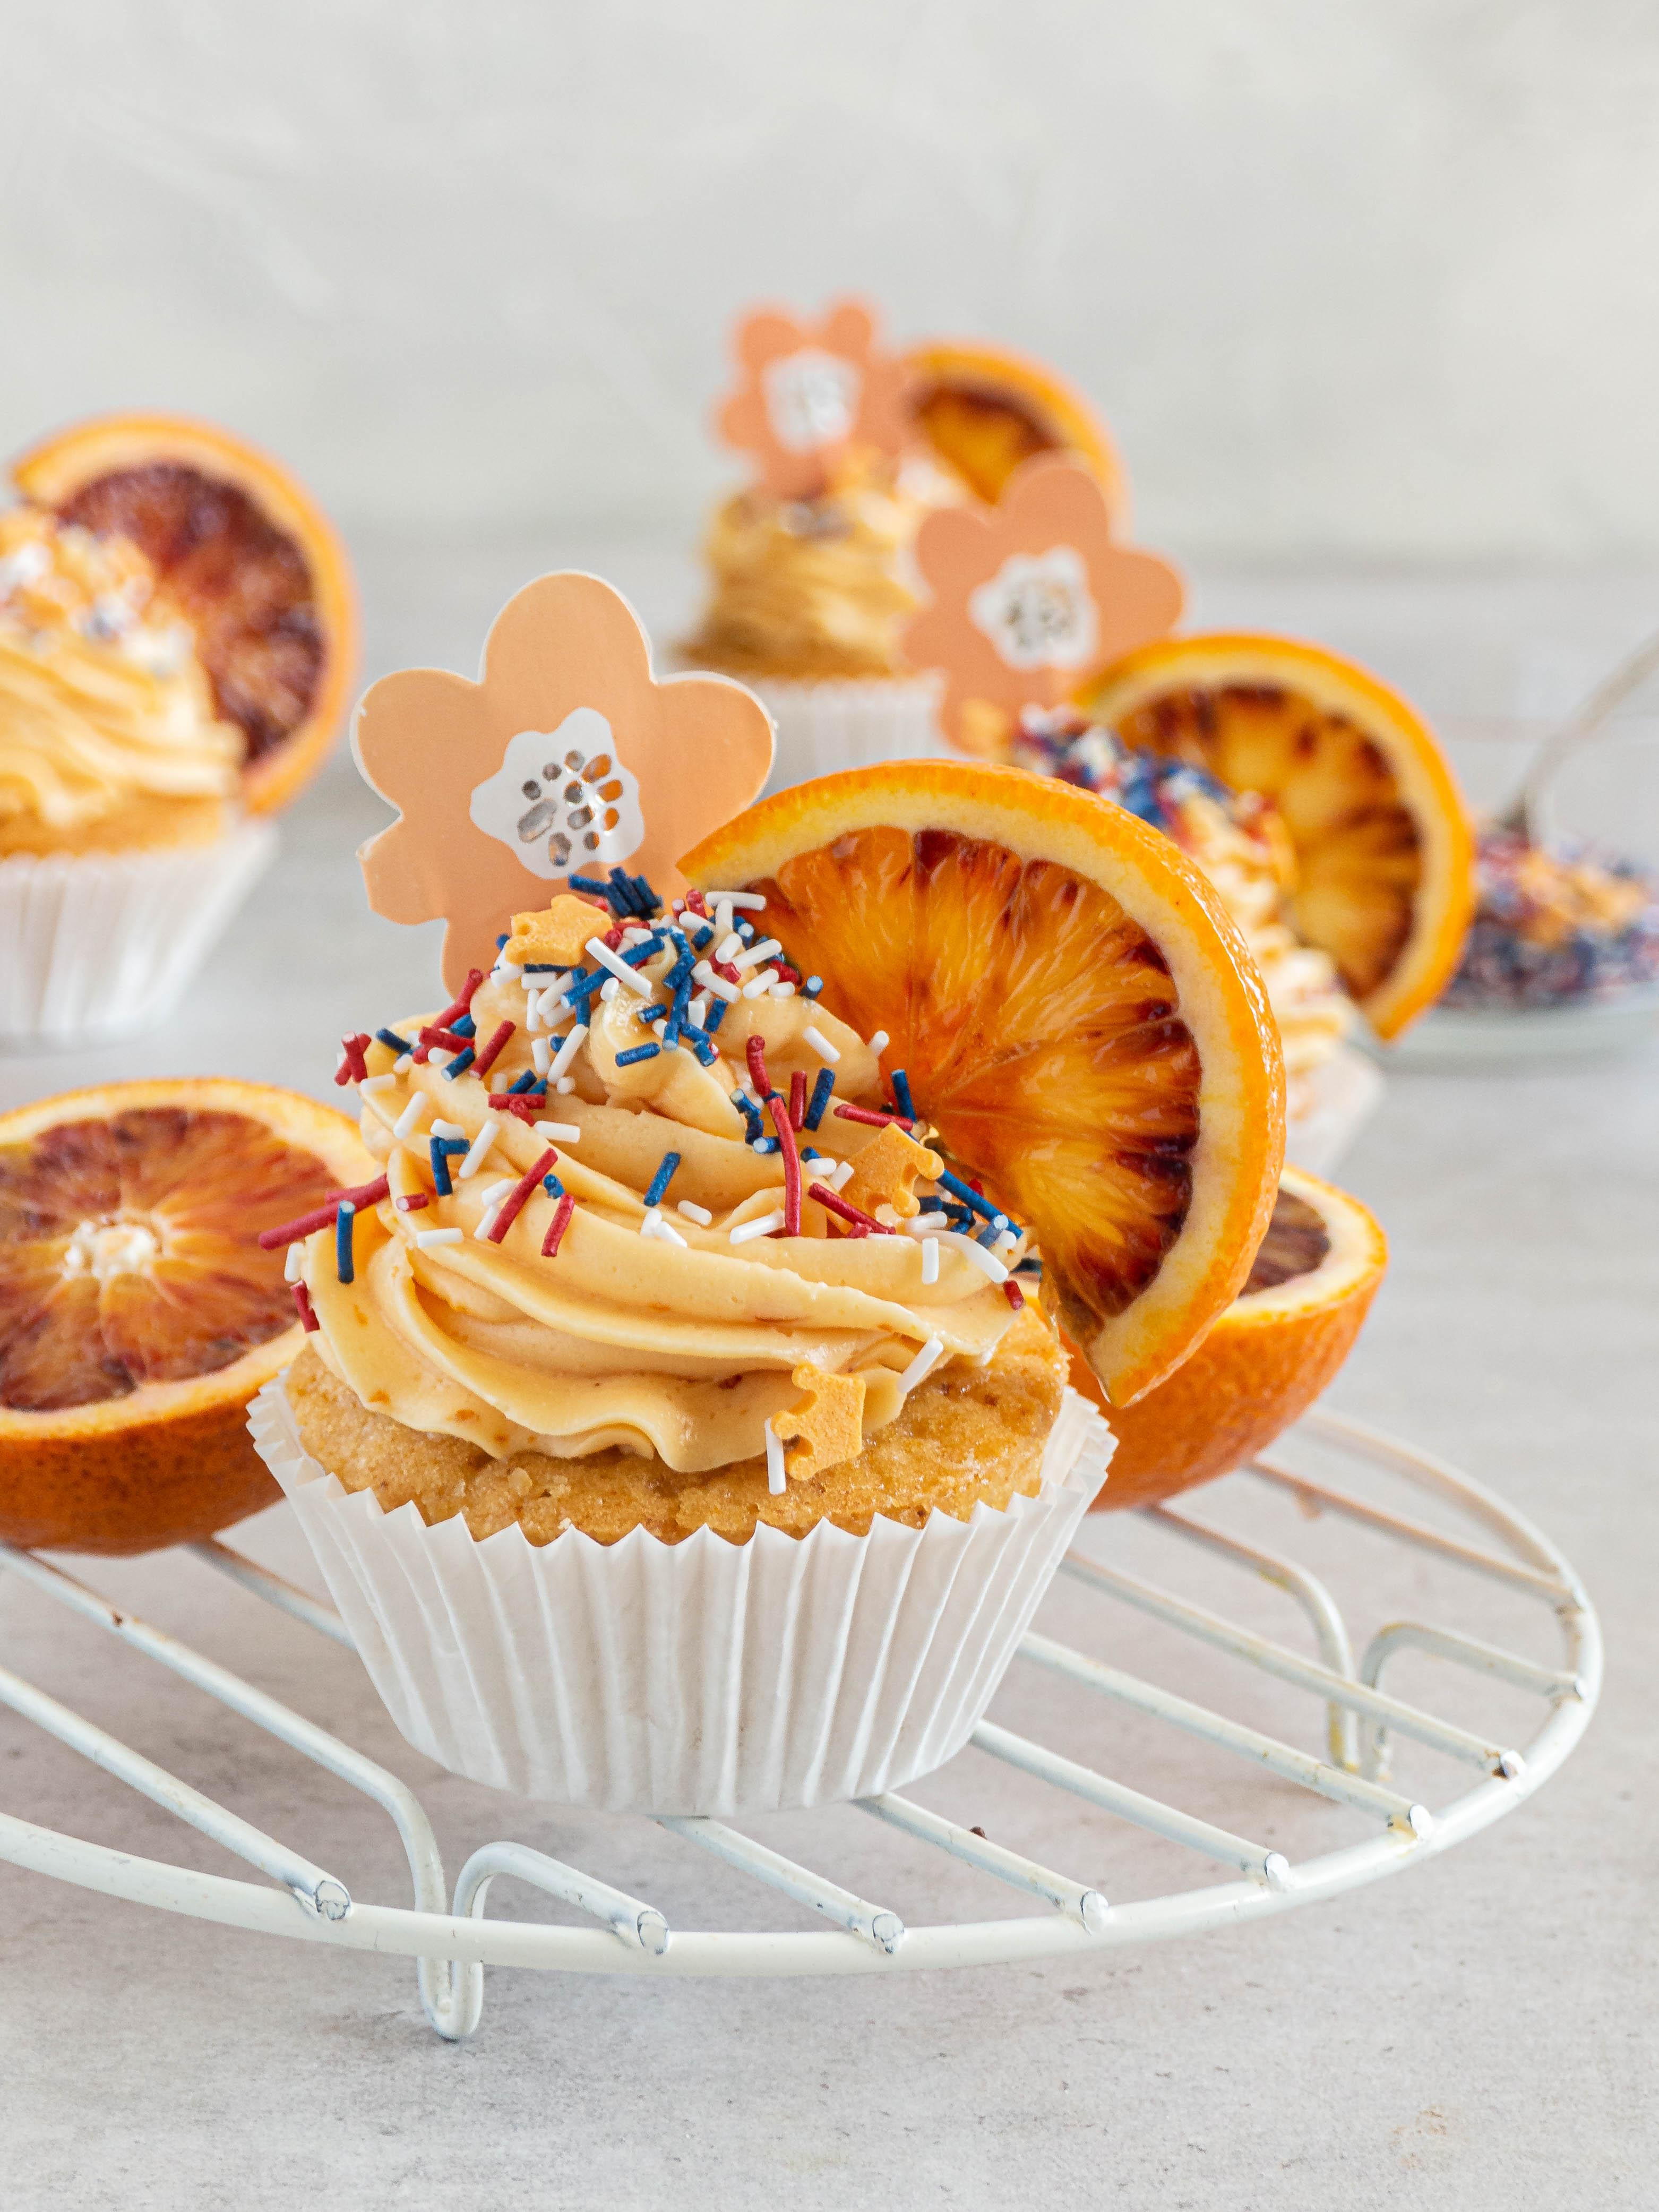 Bloedsinaasappel cupcakes